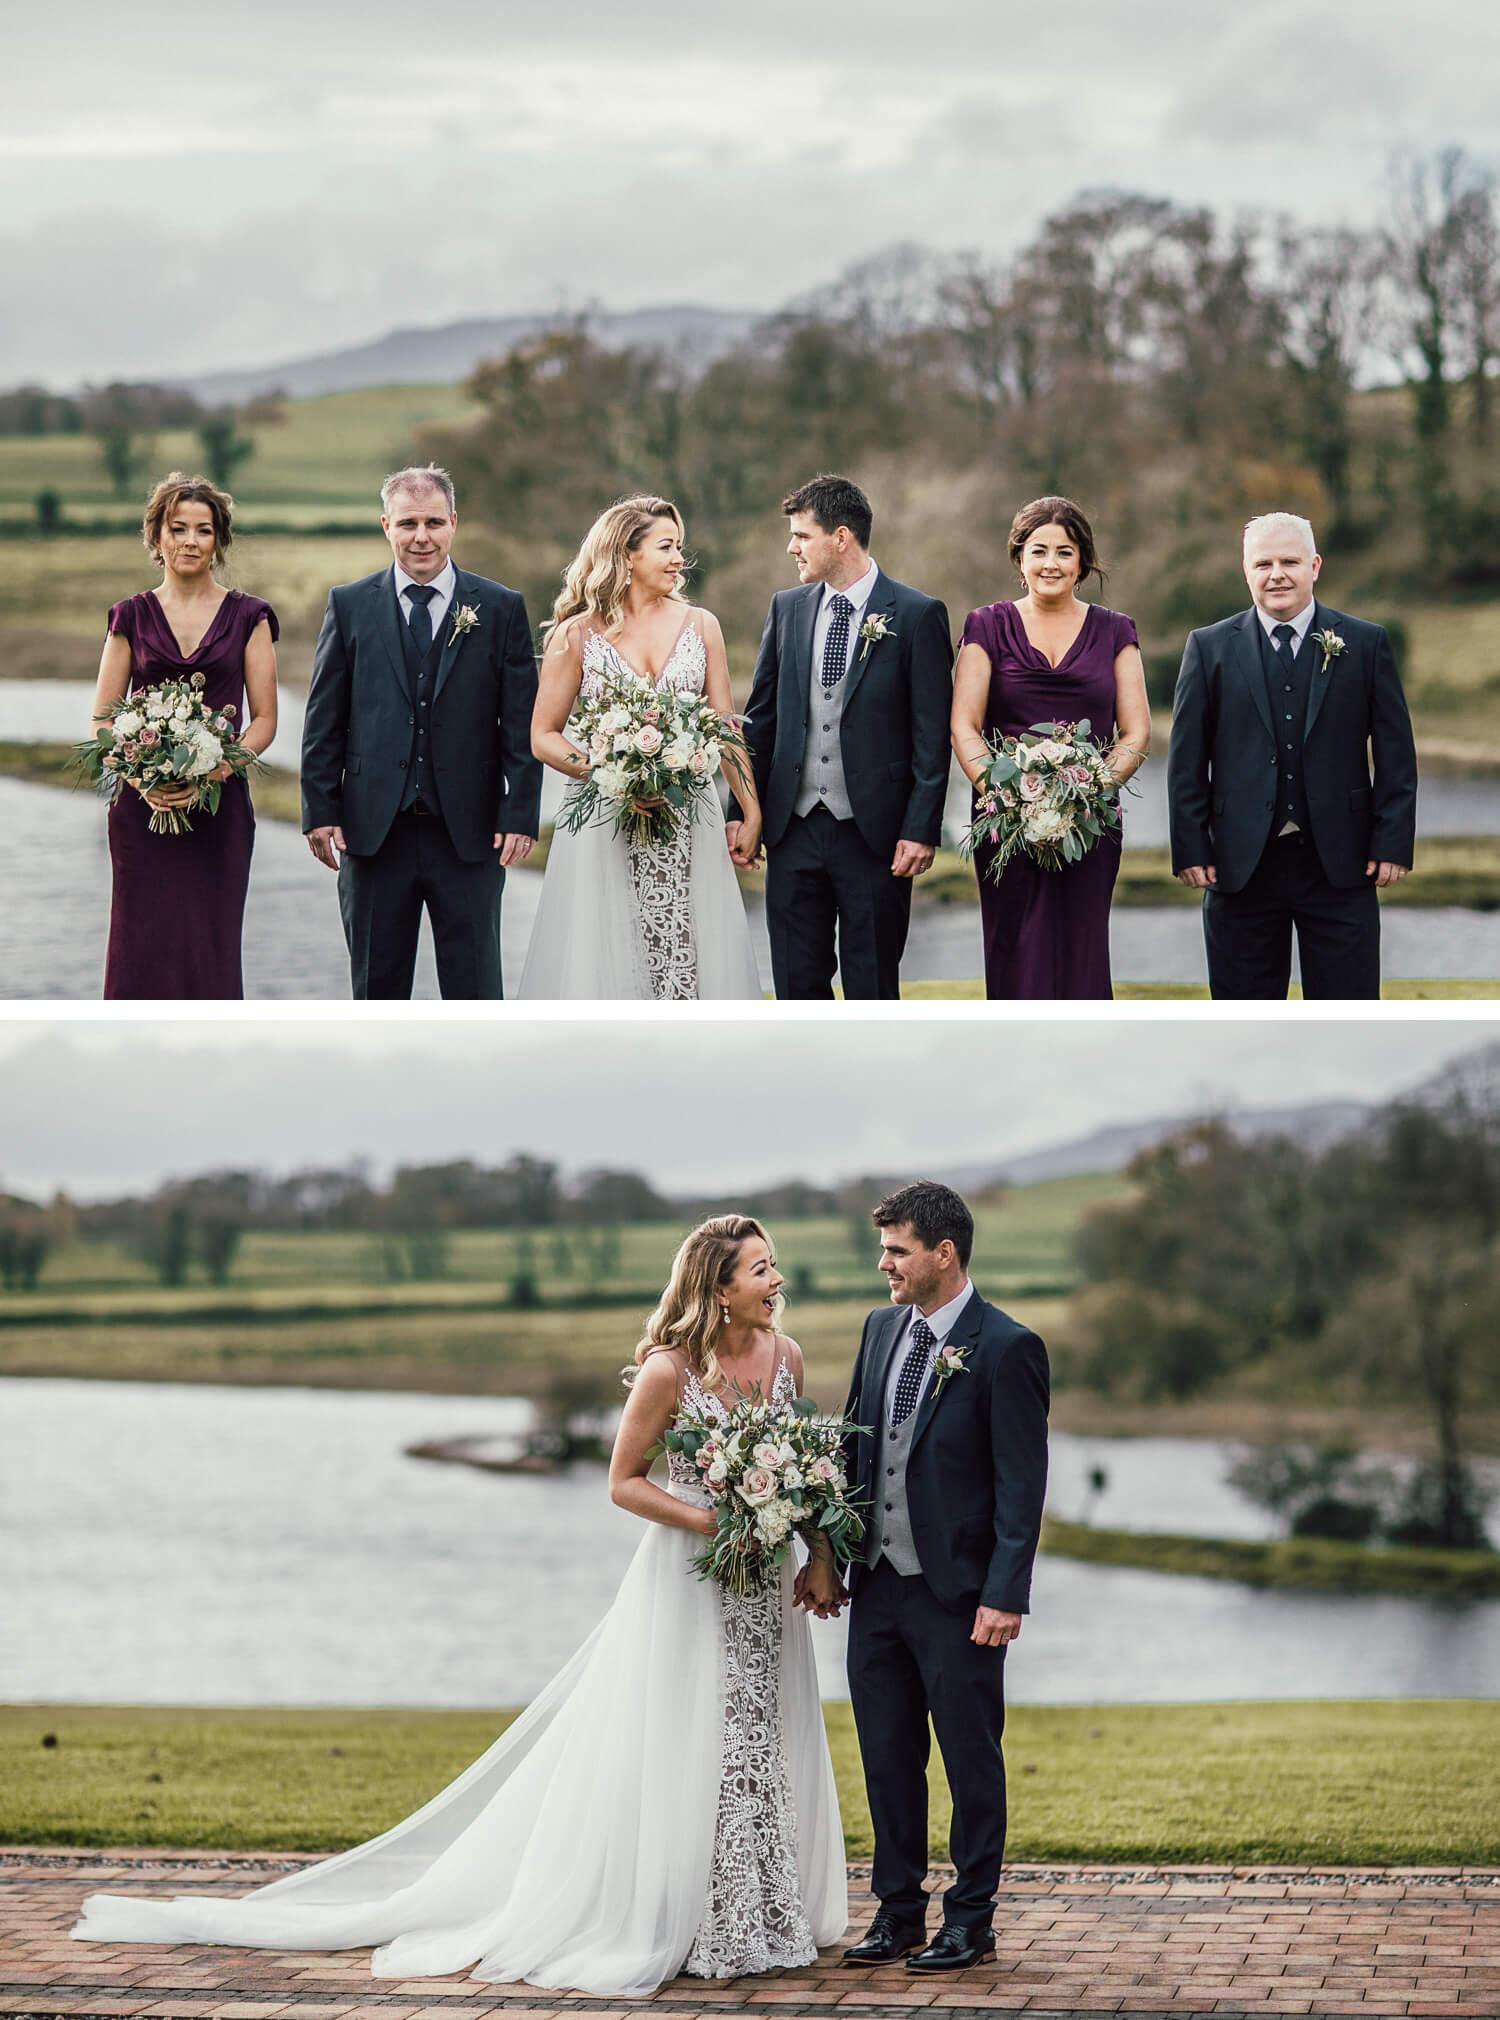 darren-fitzpatrick-photography- killyhevlin-wedding 20a